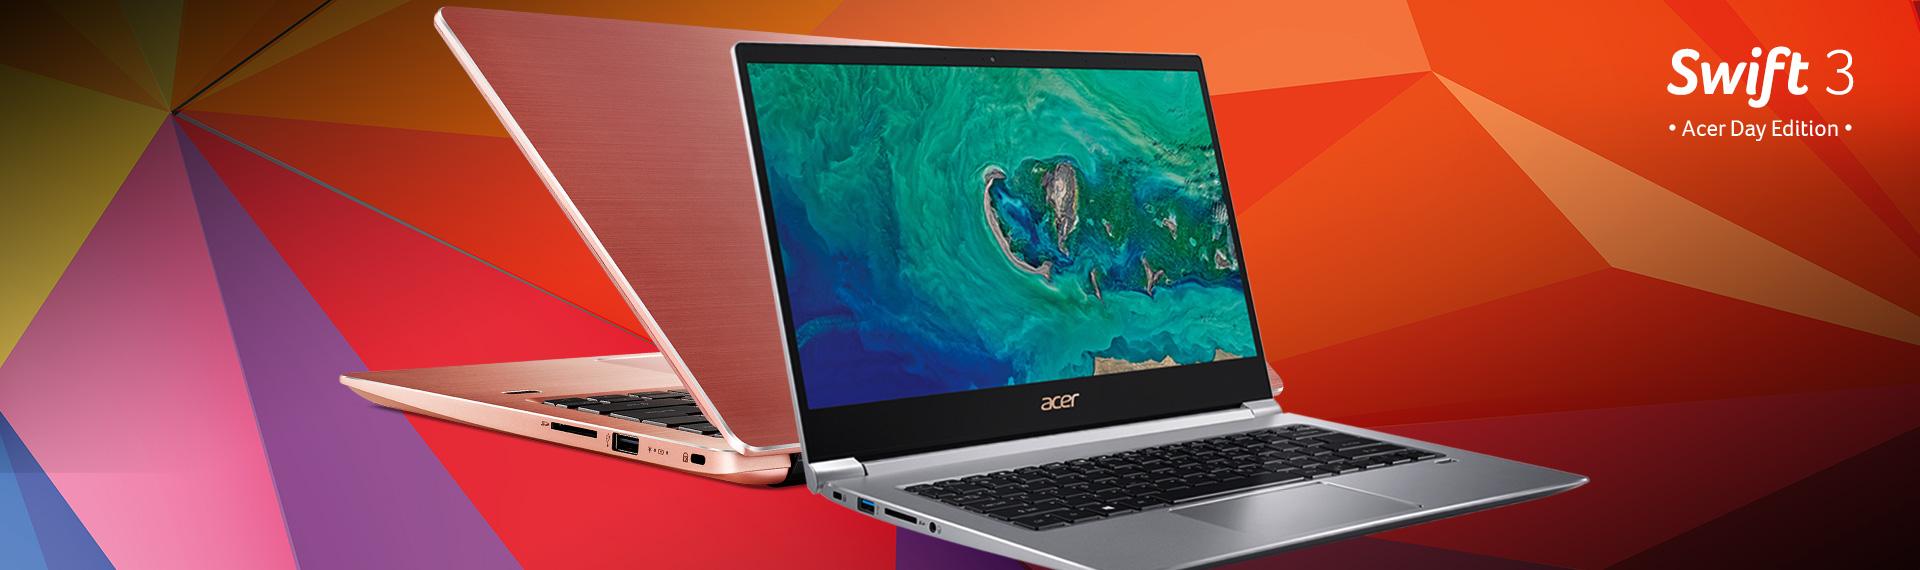 Swift 3 Acer Day Edition, Si Tipis Responsif dengan Performa Tinggi